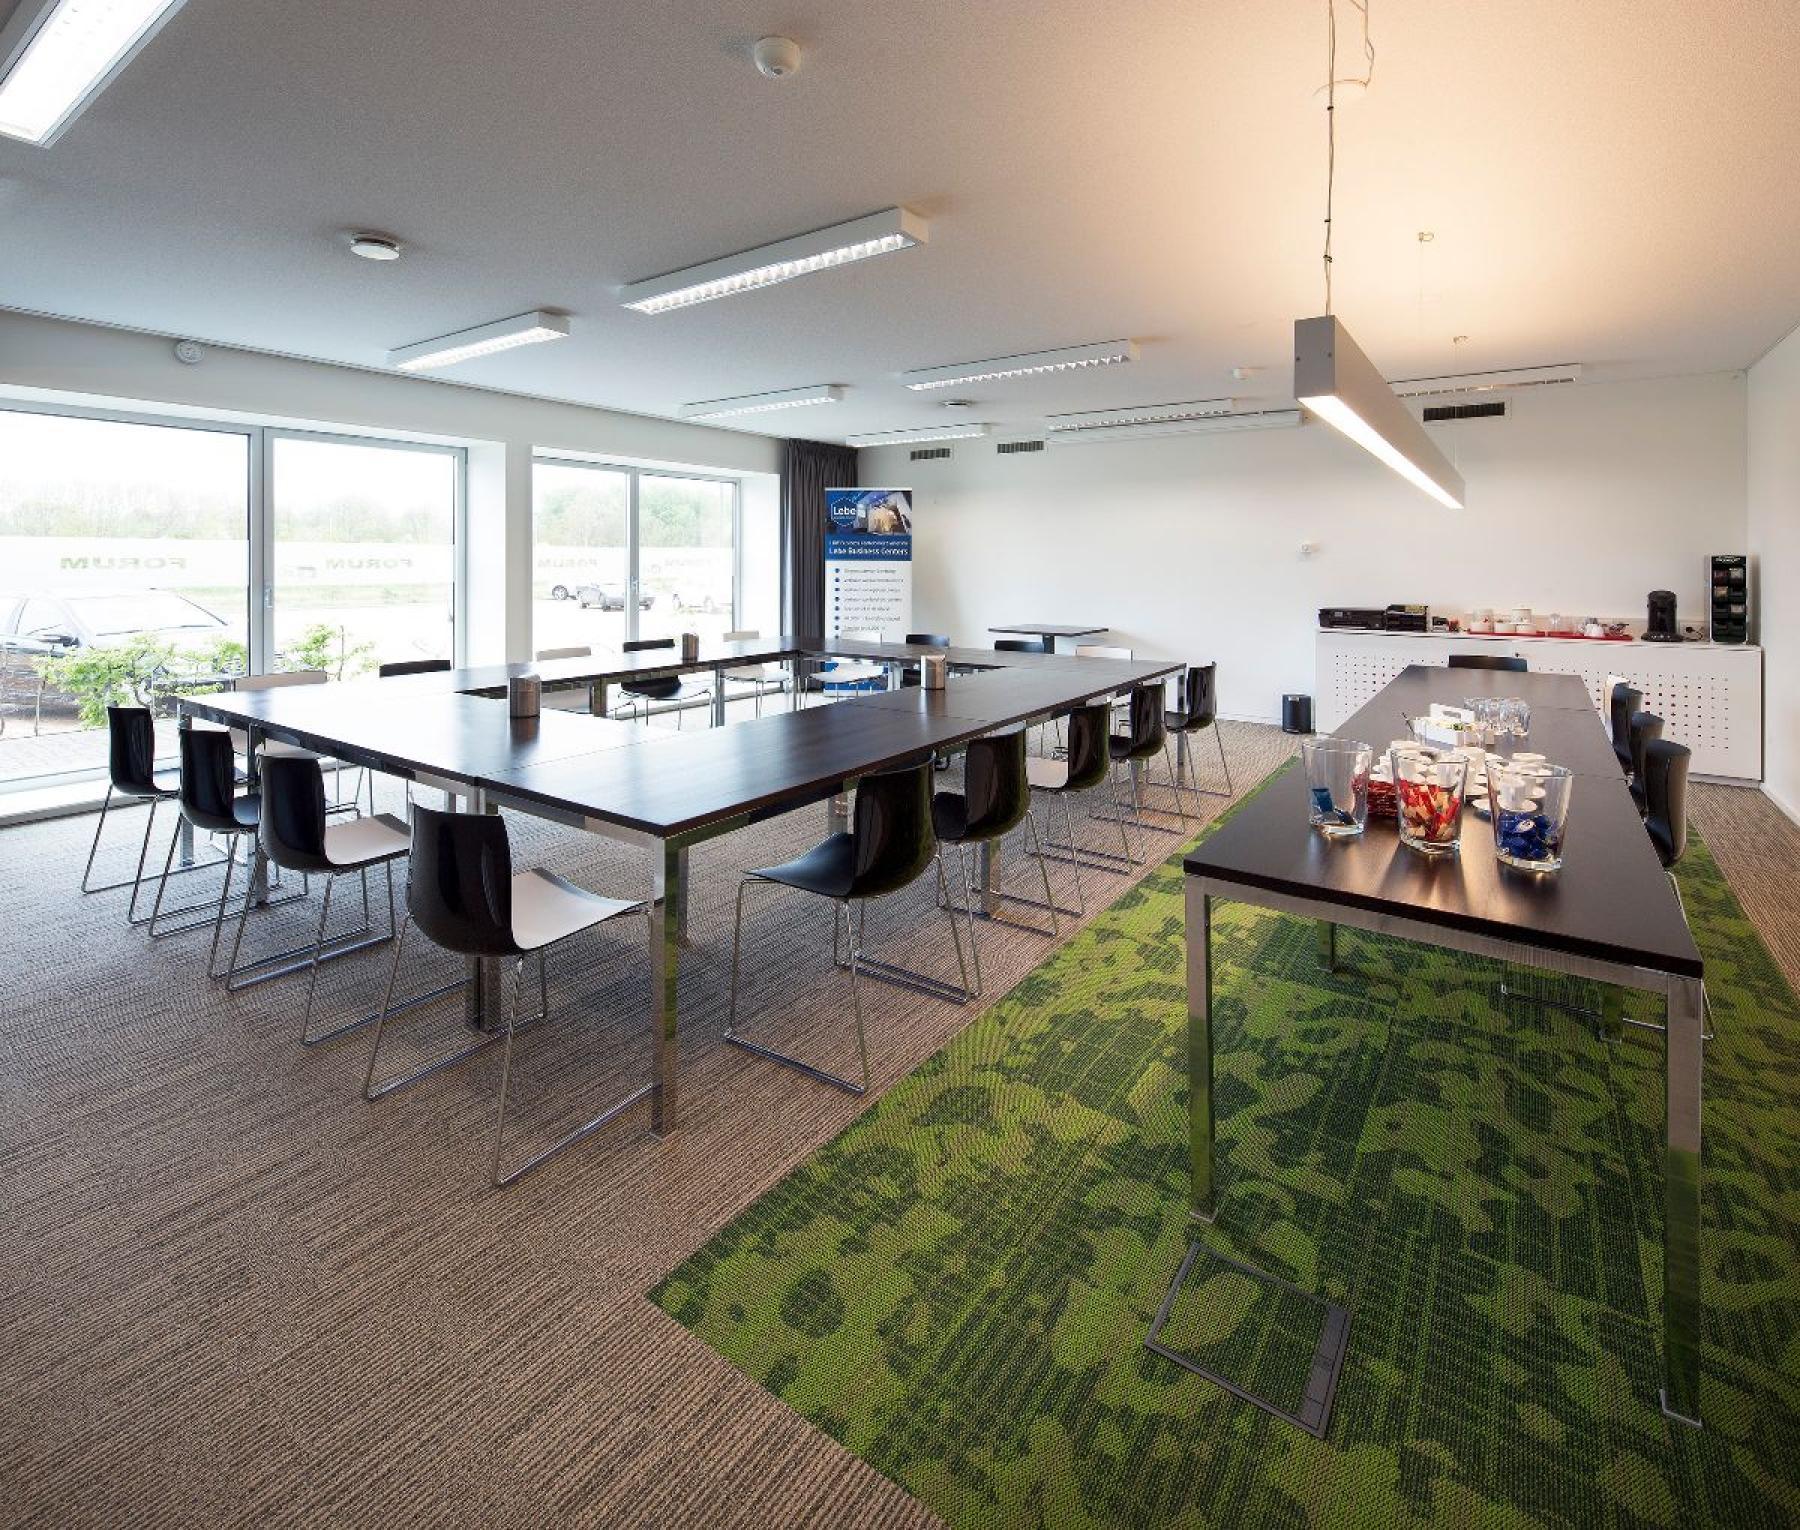 A big meetingroom